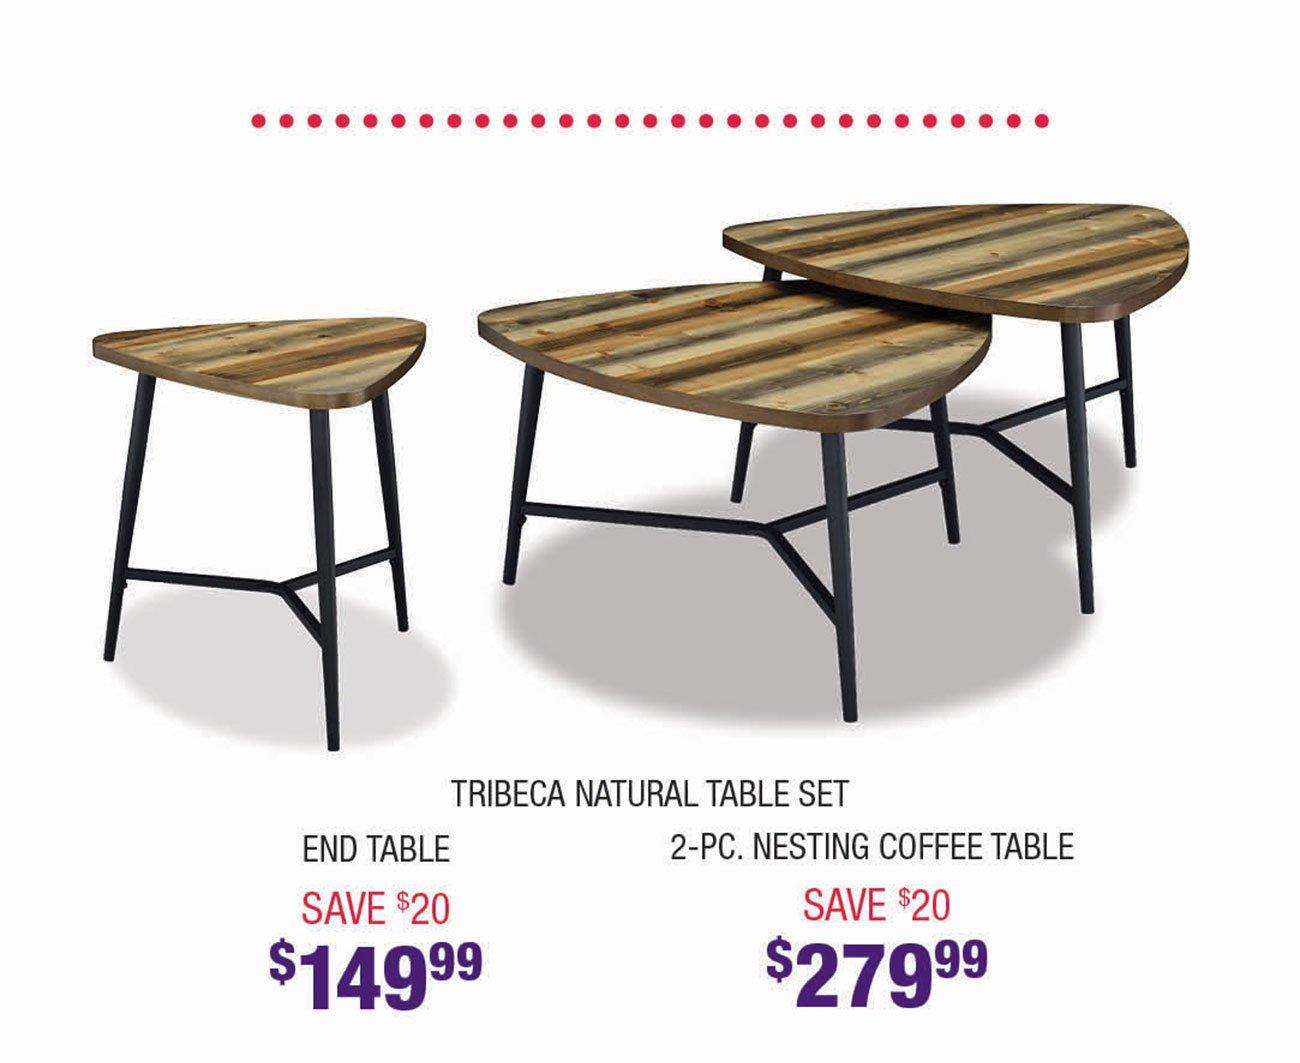 Tribeca-Natural-Table-Set